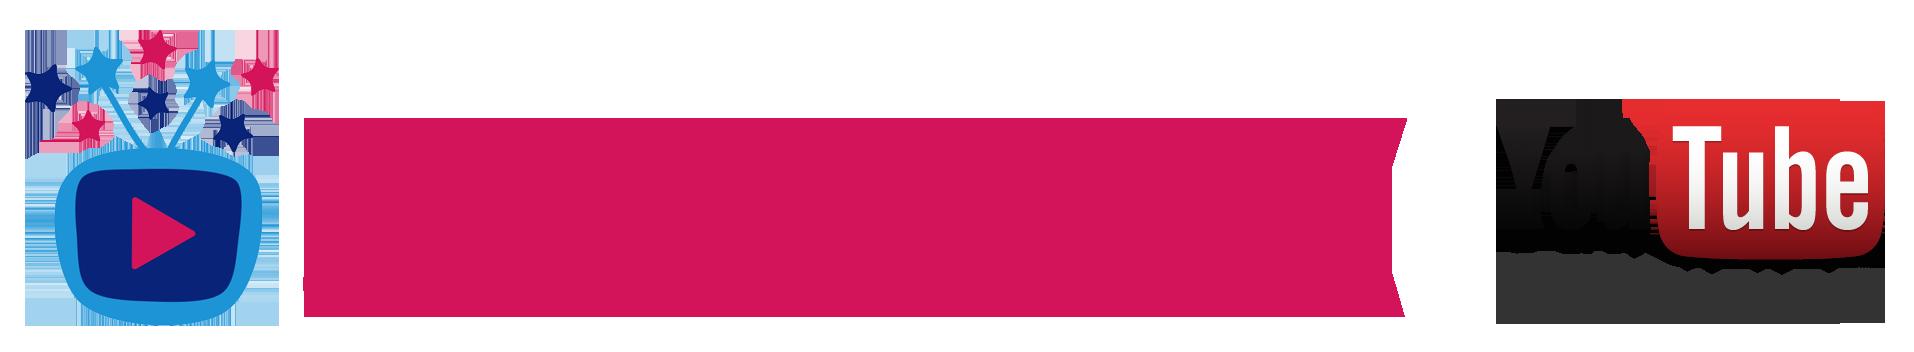 logo_vertical1.png